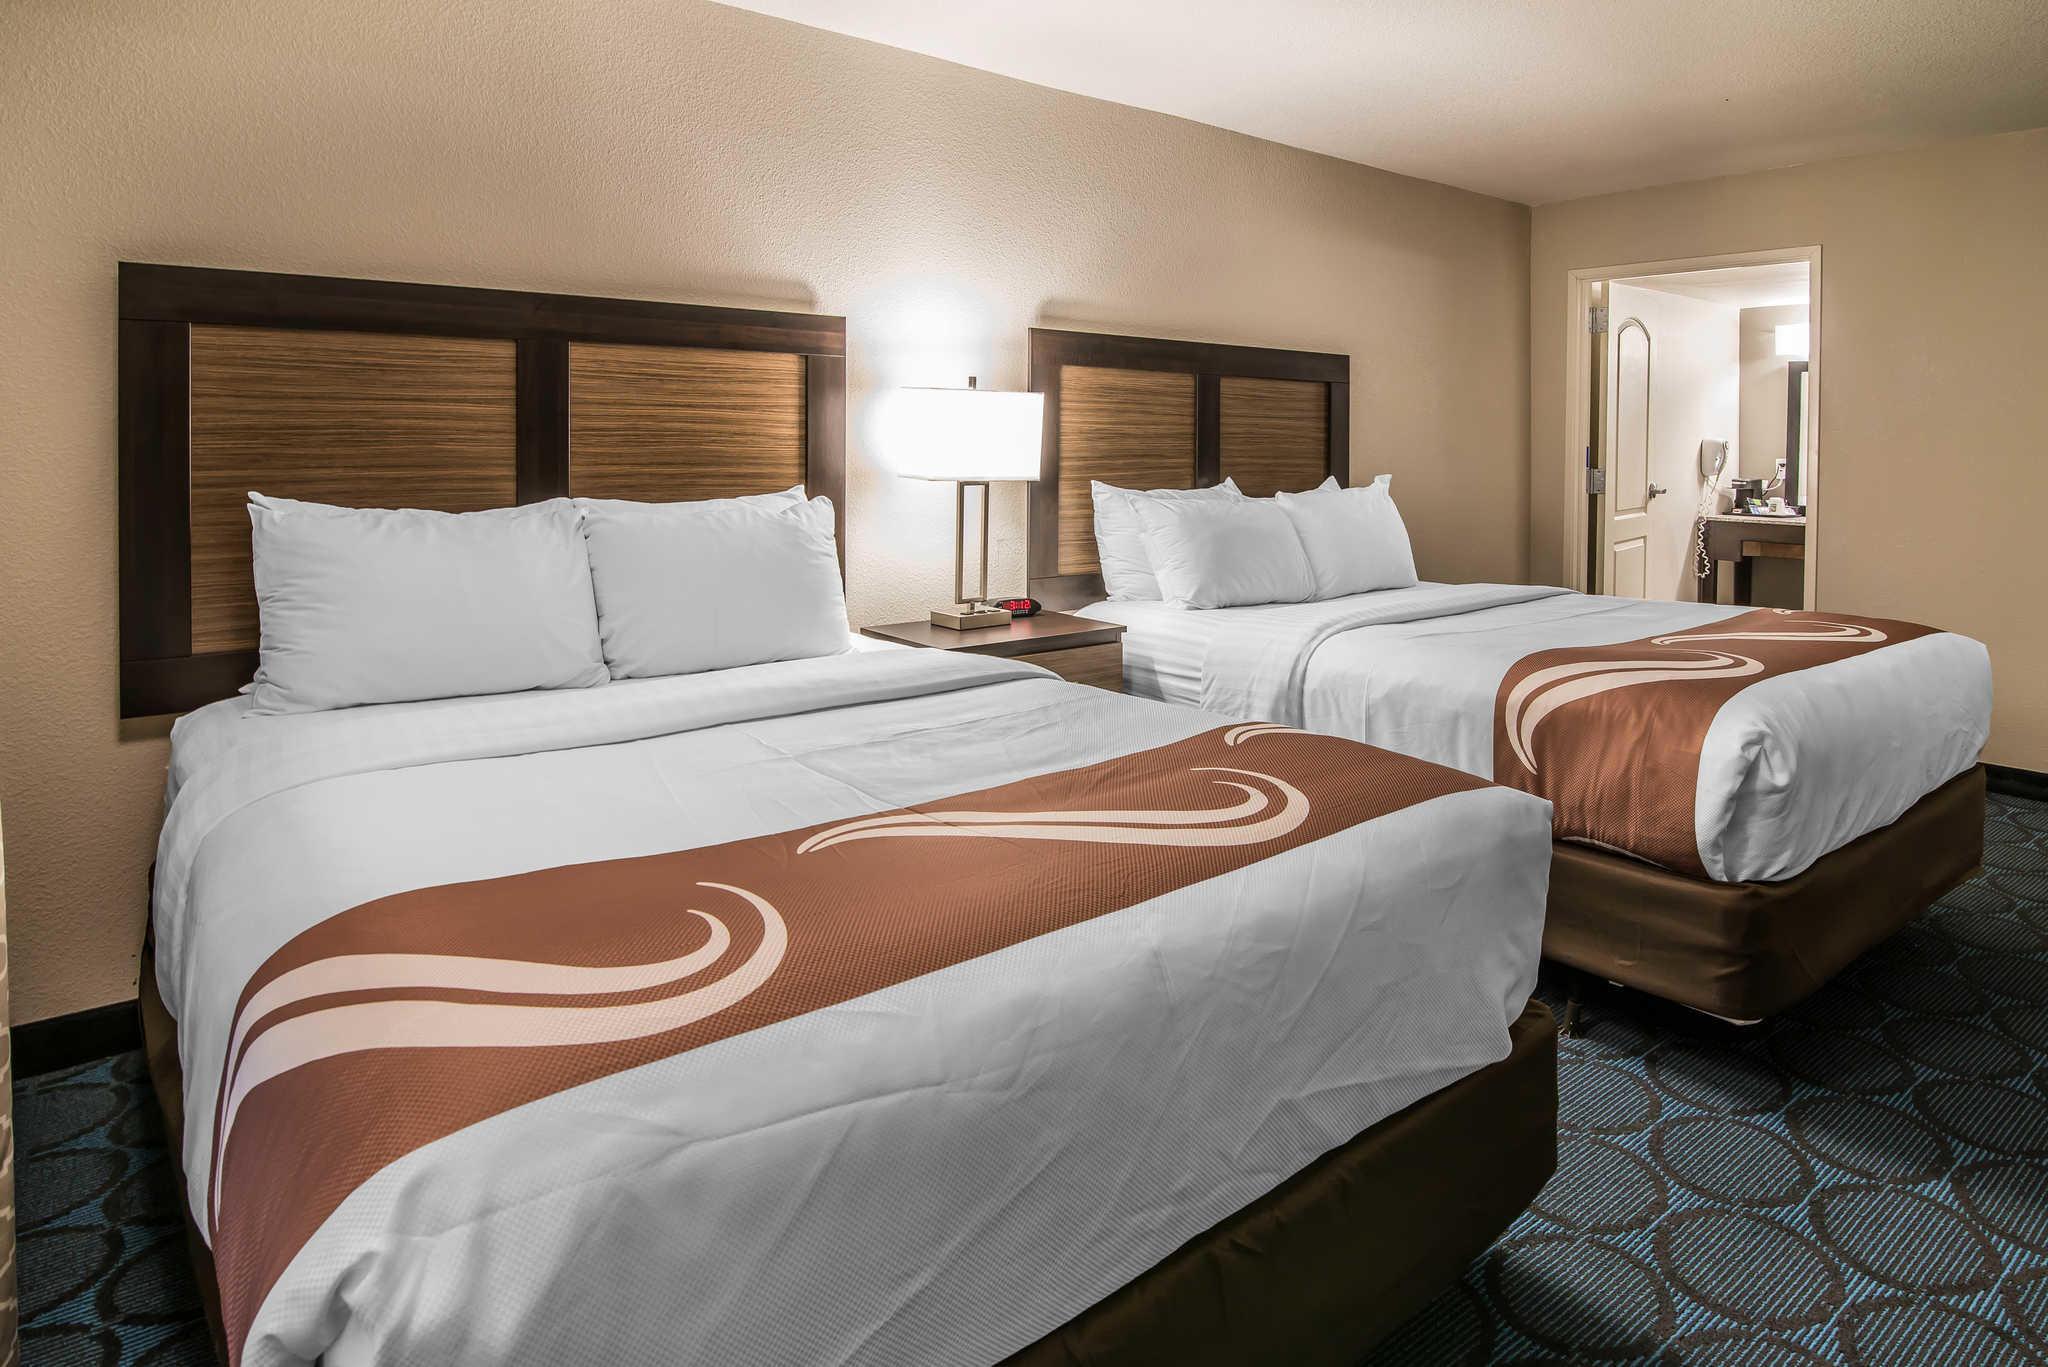 Quality Inn & Suites - Ruidoso Hwy 70 image 11